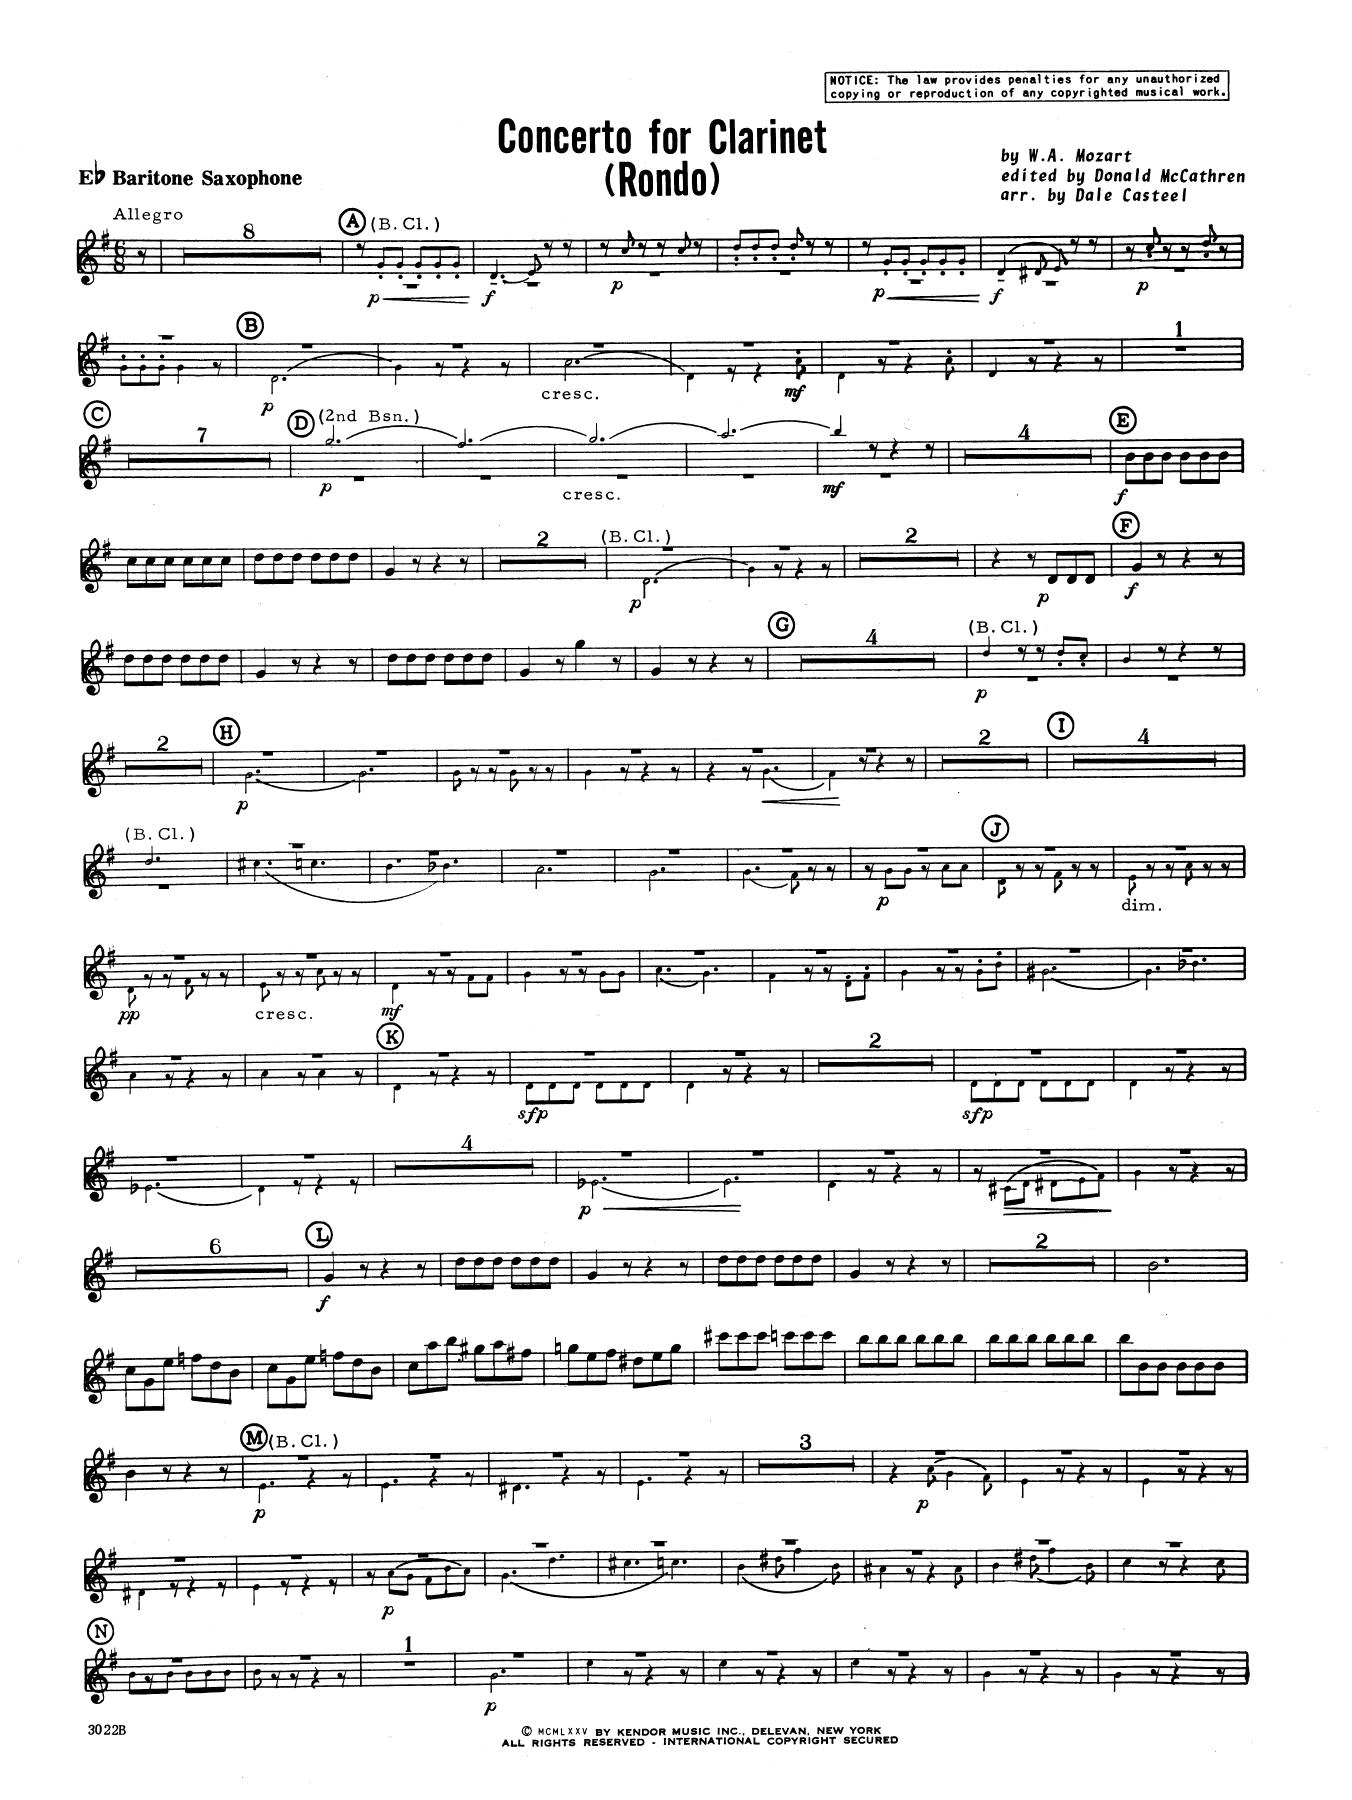 Donald McCathren and Dale Casteel Concerto For Clarinet - Rondo (3rd Movement) - K.622 - Eb Baritone Saxophone sheet music notes printable PDF score